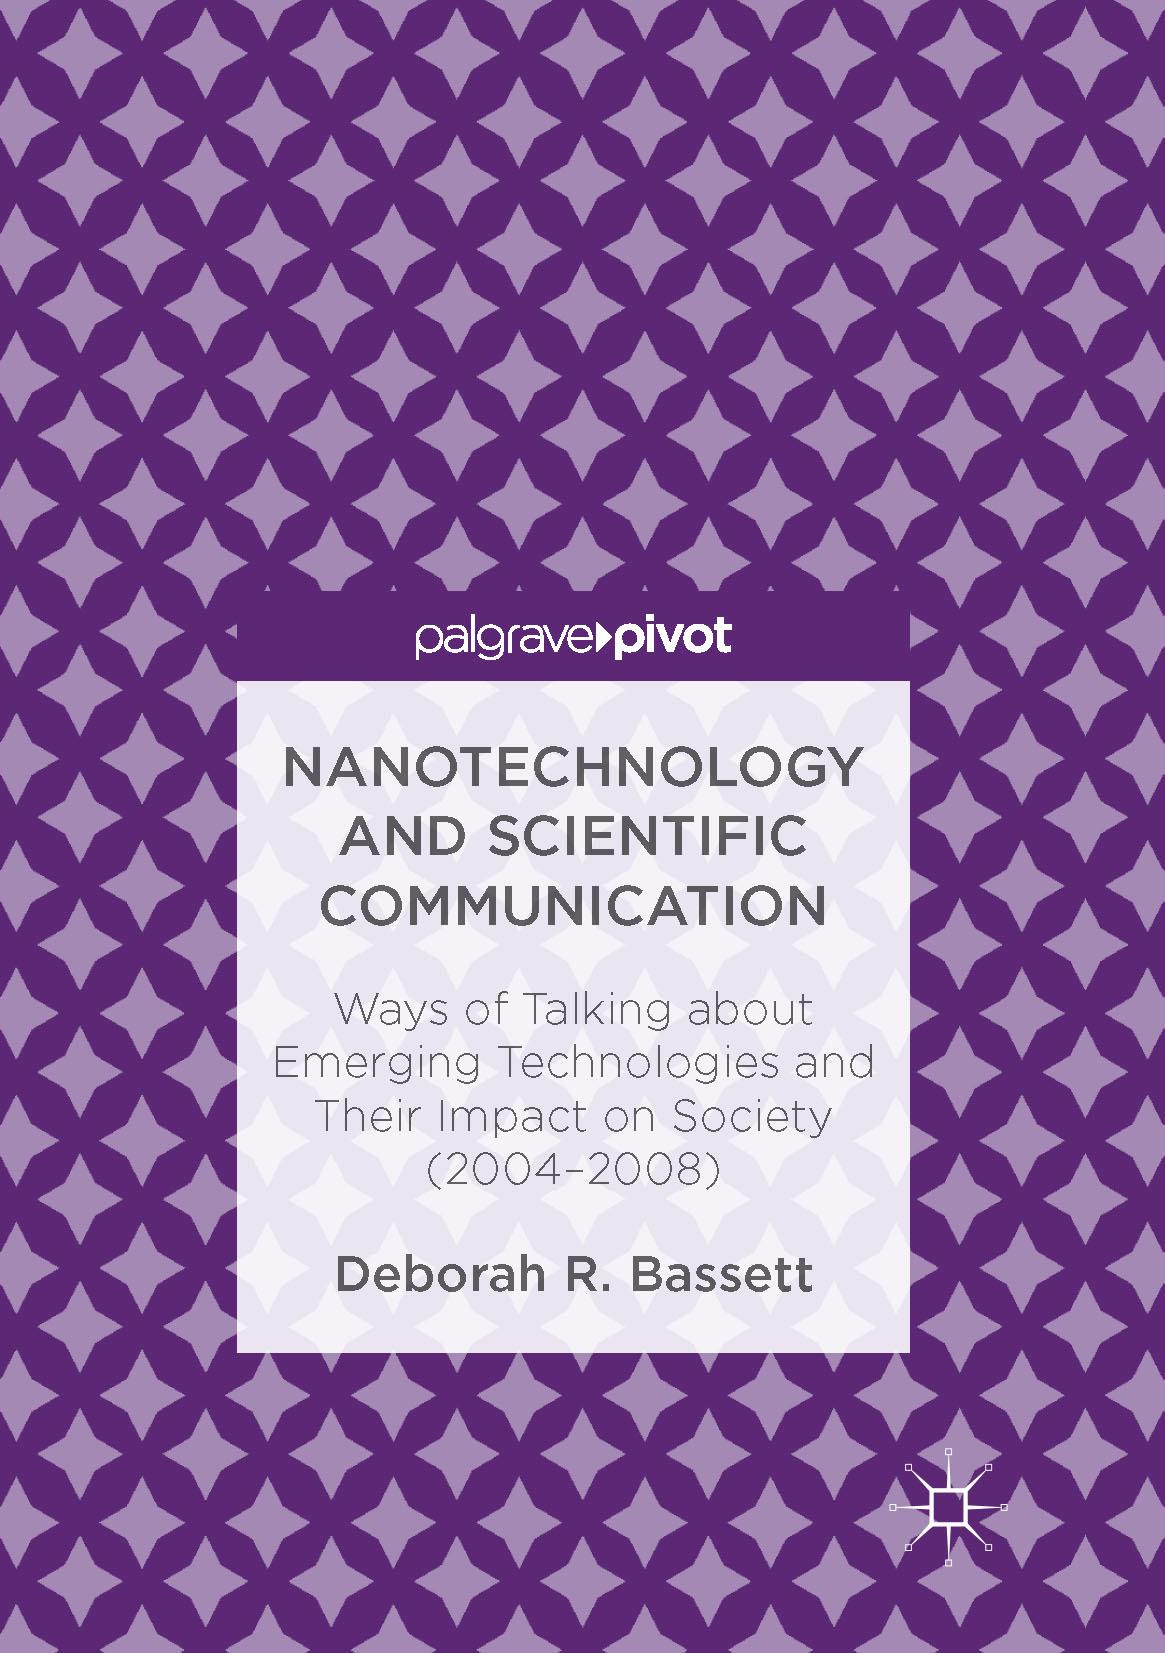 Bassett, Deborah R. - Nanotechnology and Scientific Communication, ebook